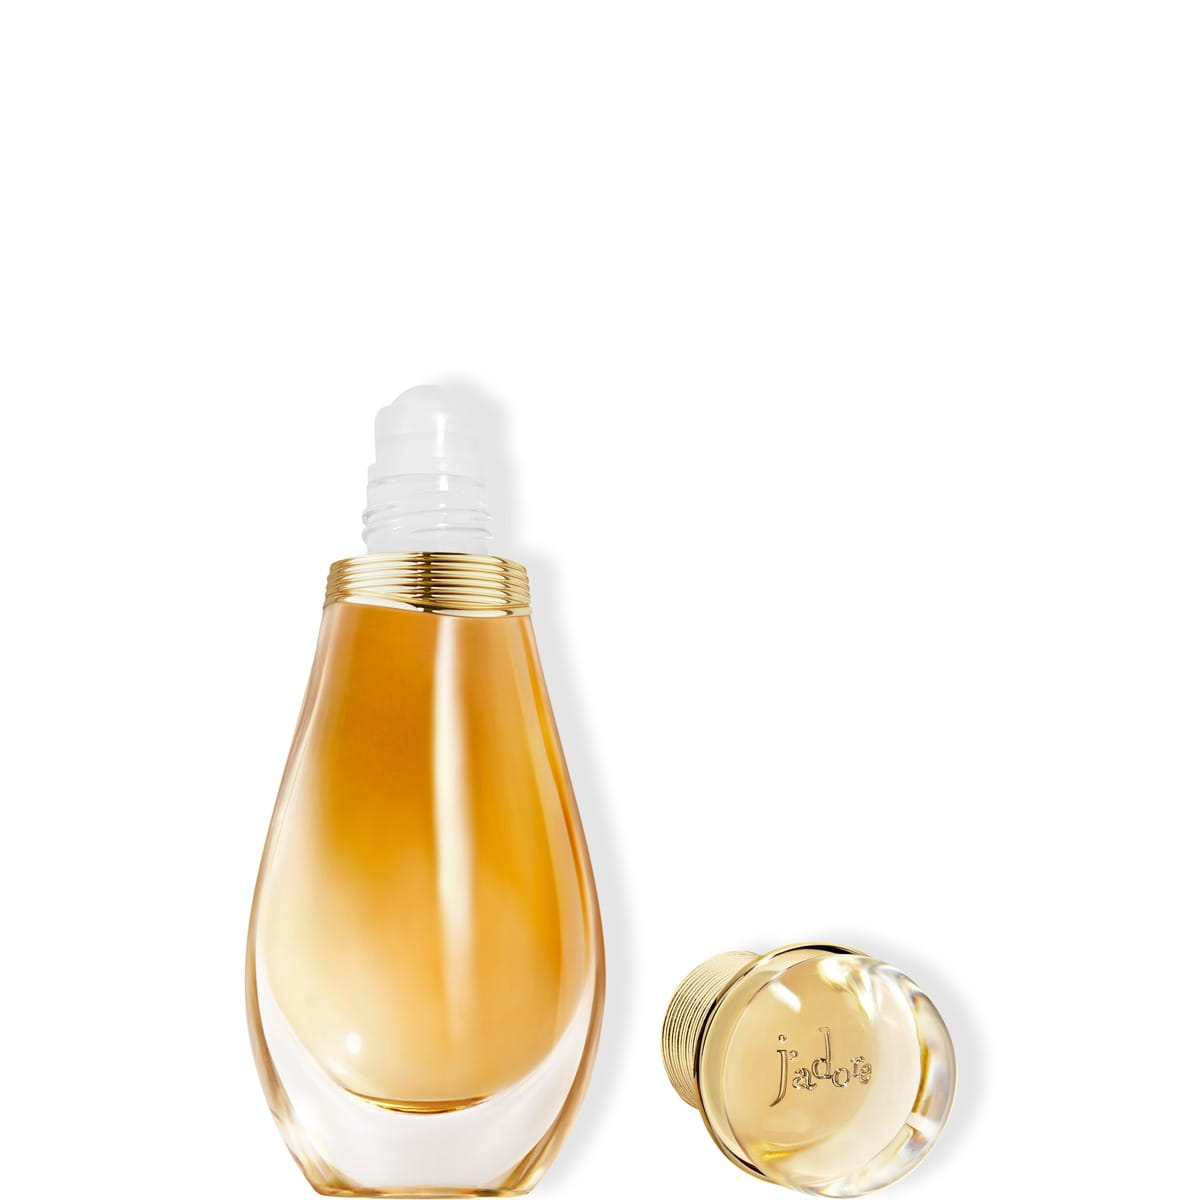 J'adore infinissime Eau de Parfum Roller-Pearl - DIOR